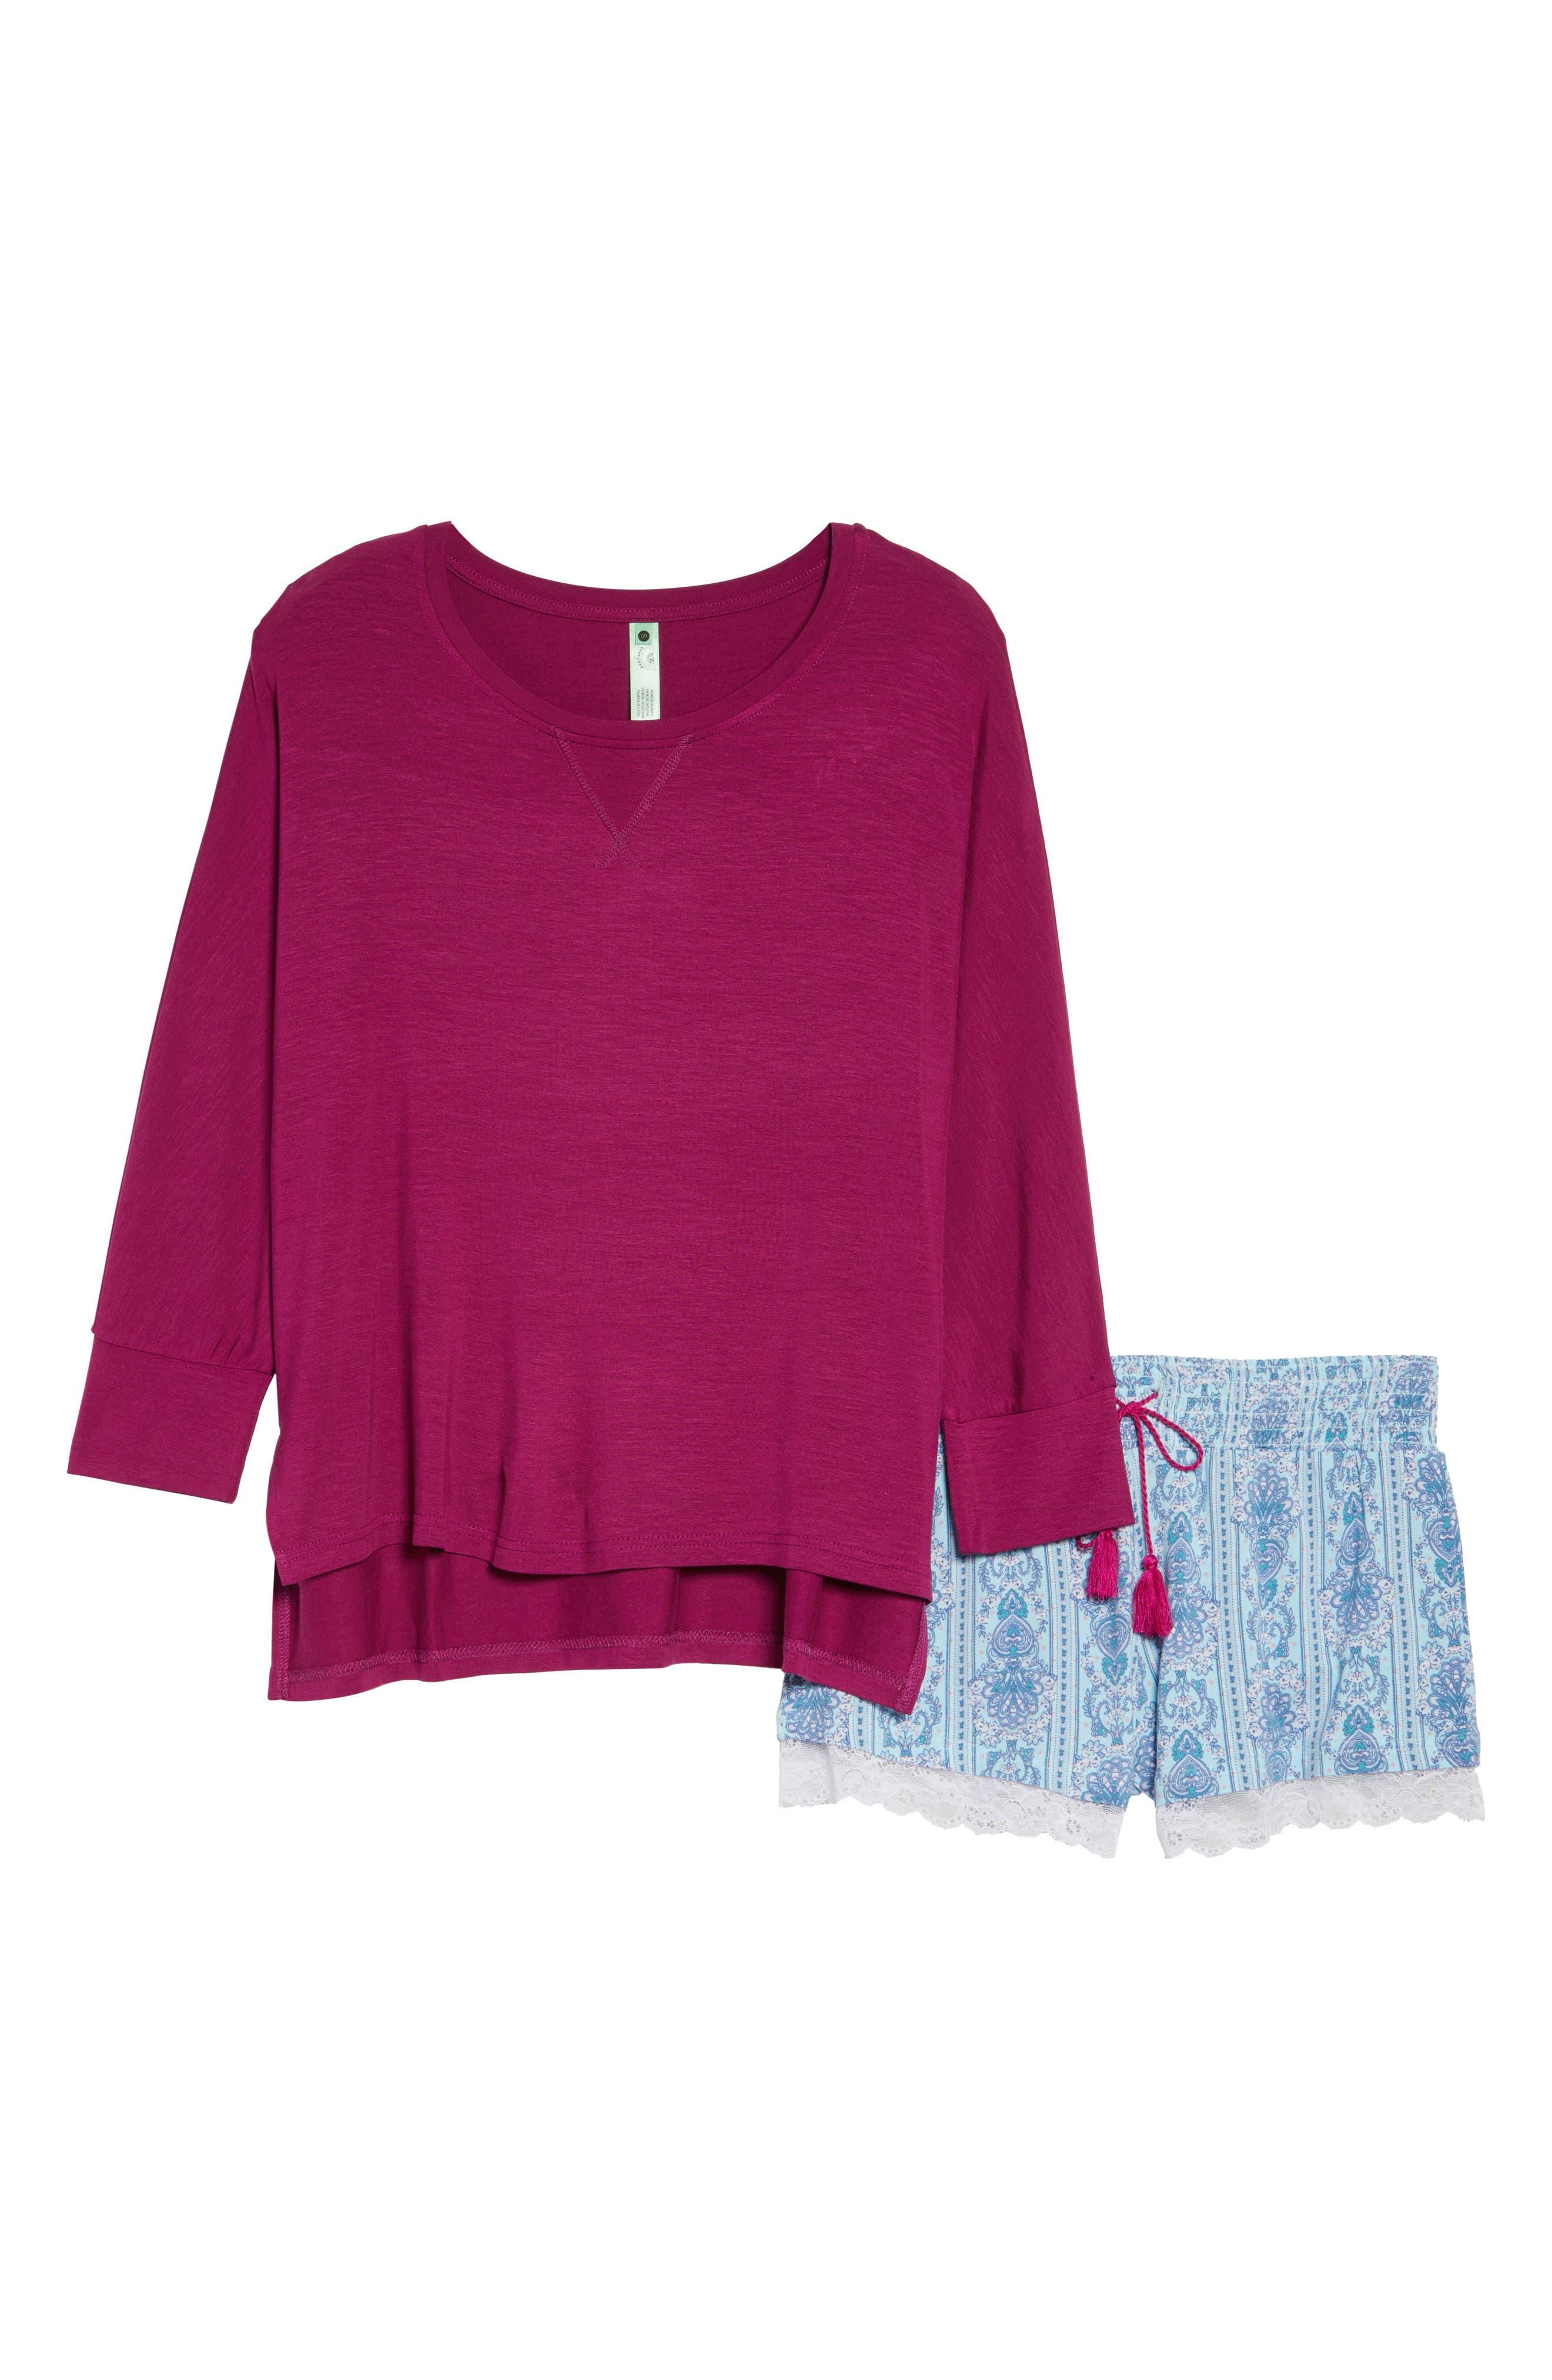 Honeydew Short Pajamas,                             Alternate thumbnail 4, color,                             Tuscany